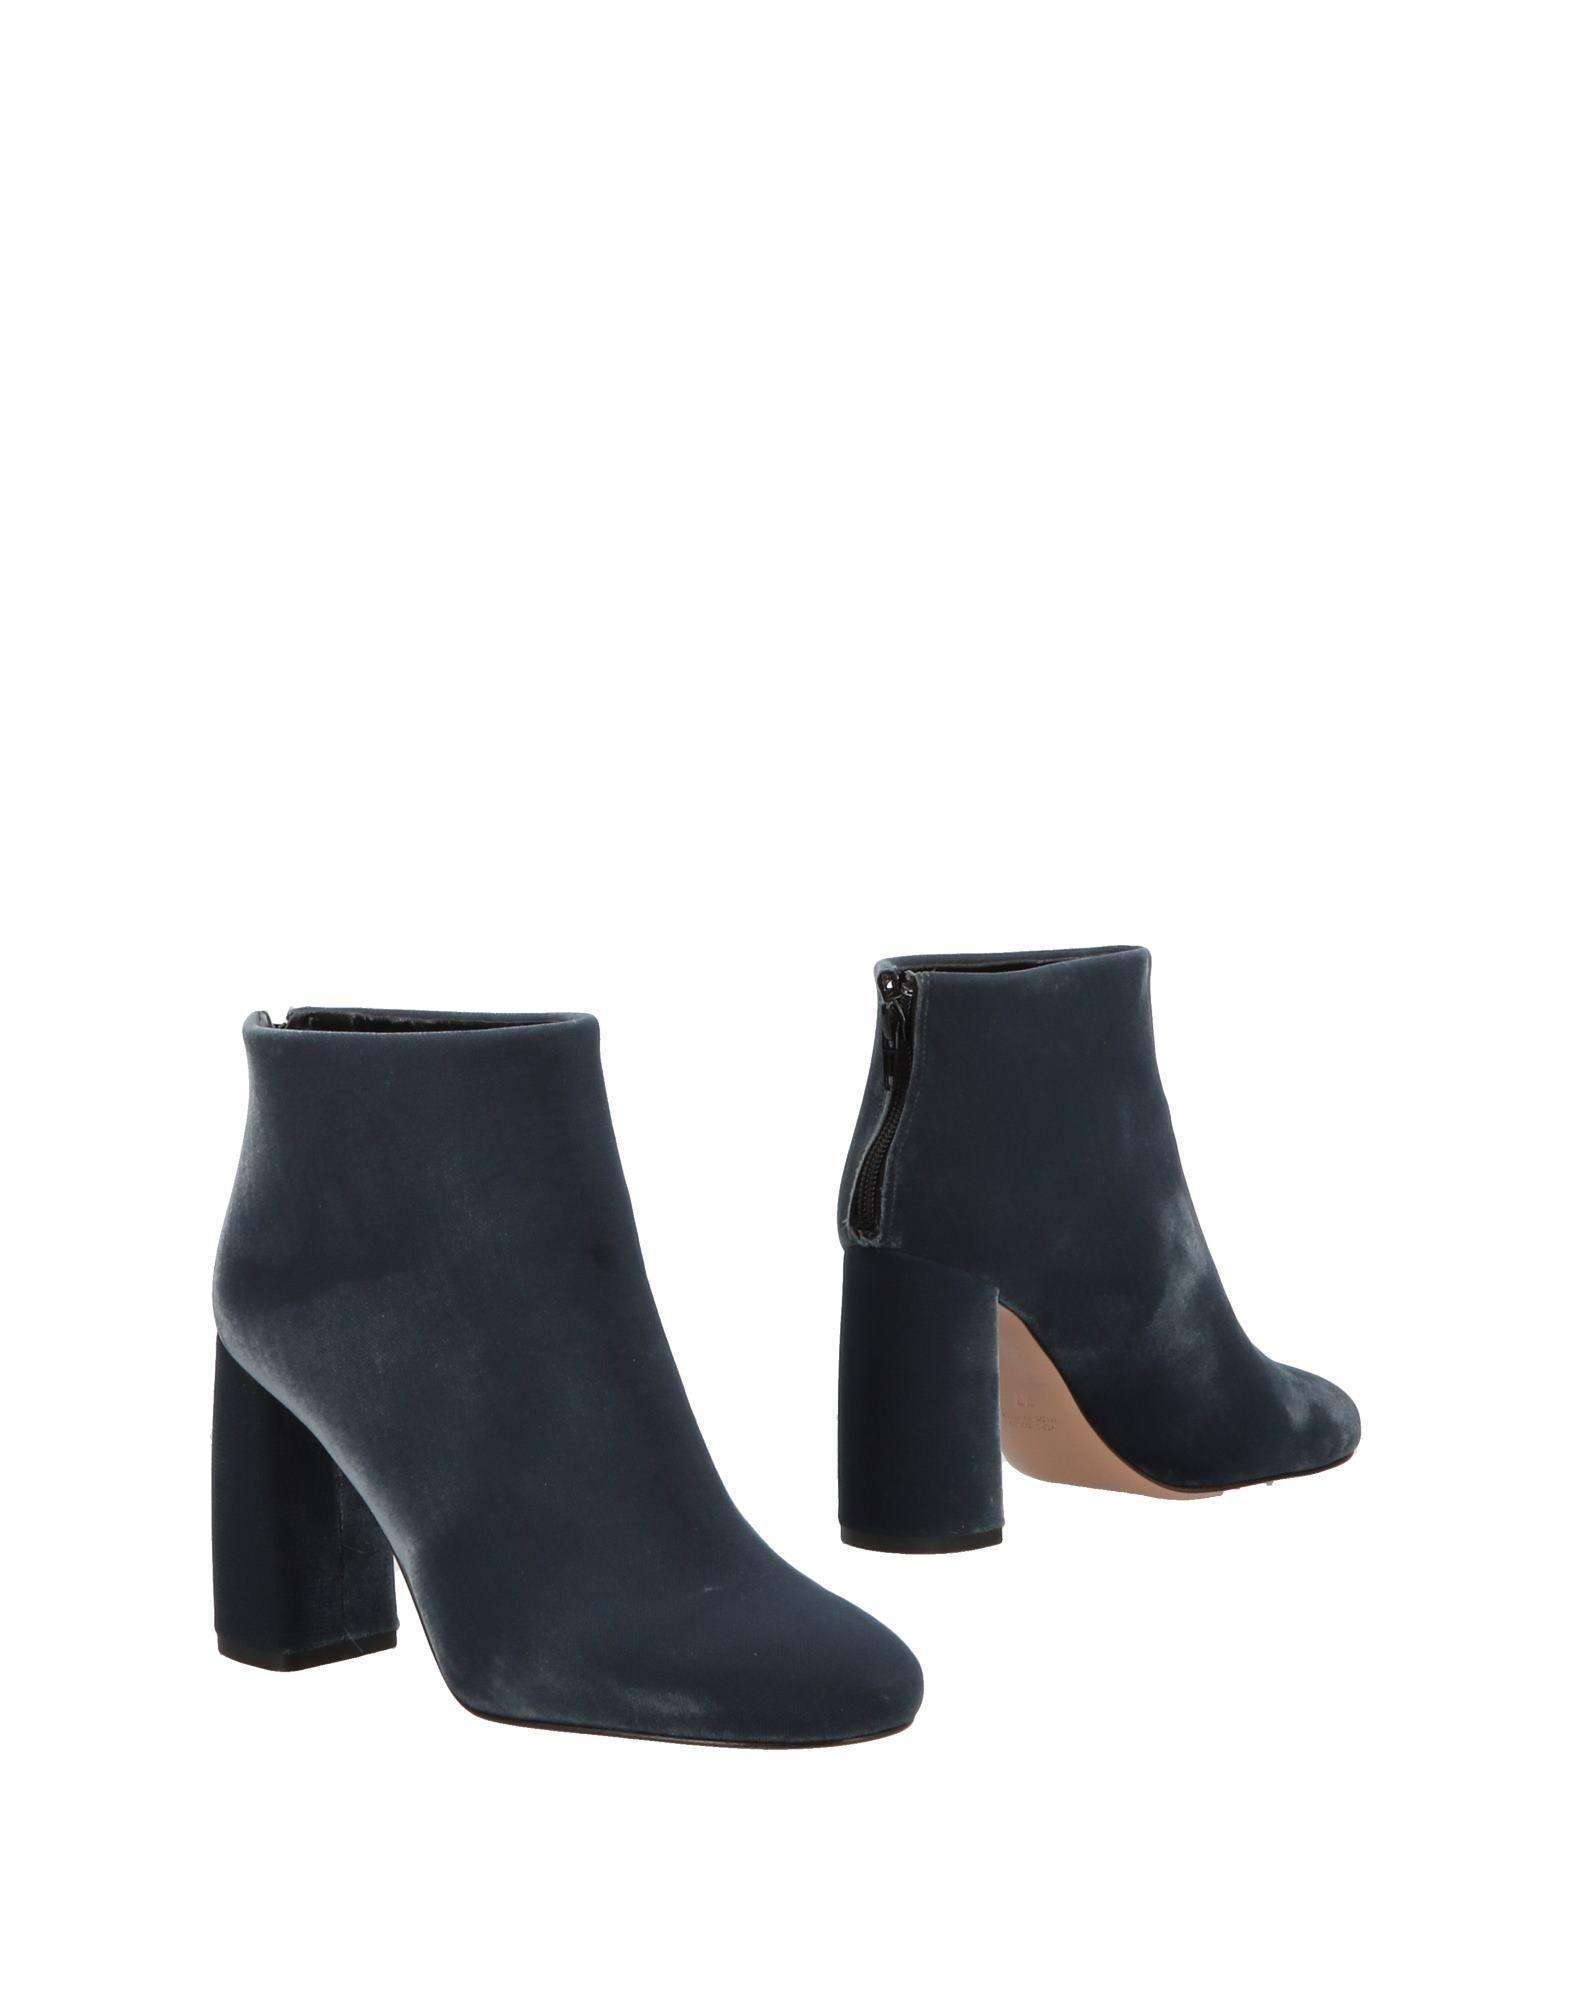 Stilvolle billige Schuhe Damen Studio Spiga Stiefelette Damen Schuhe  11504419EM 2dcb8f